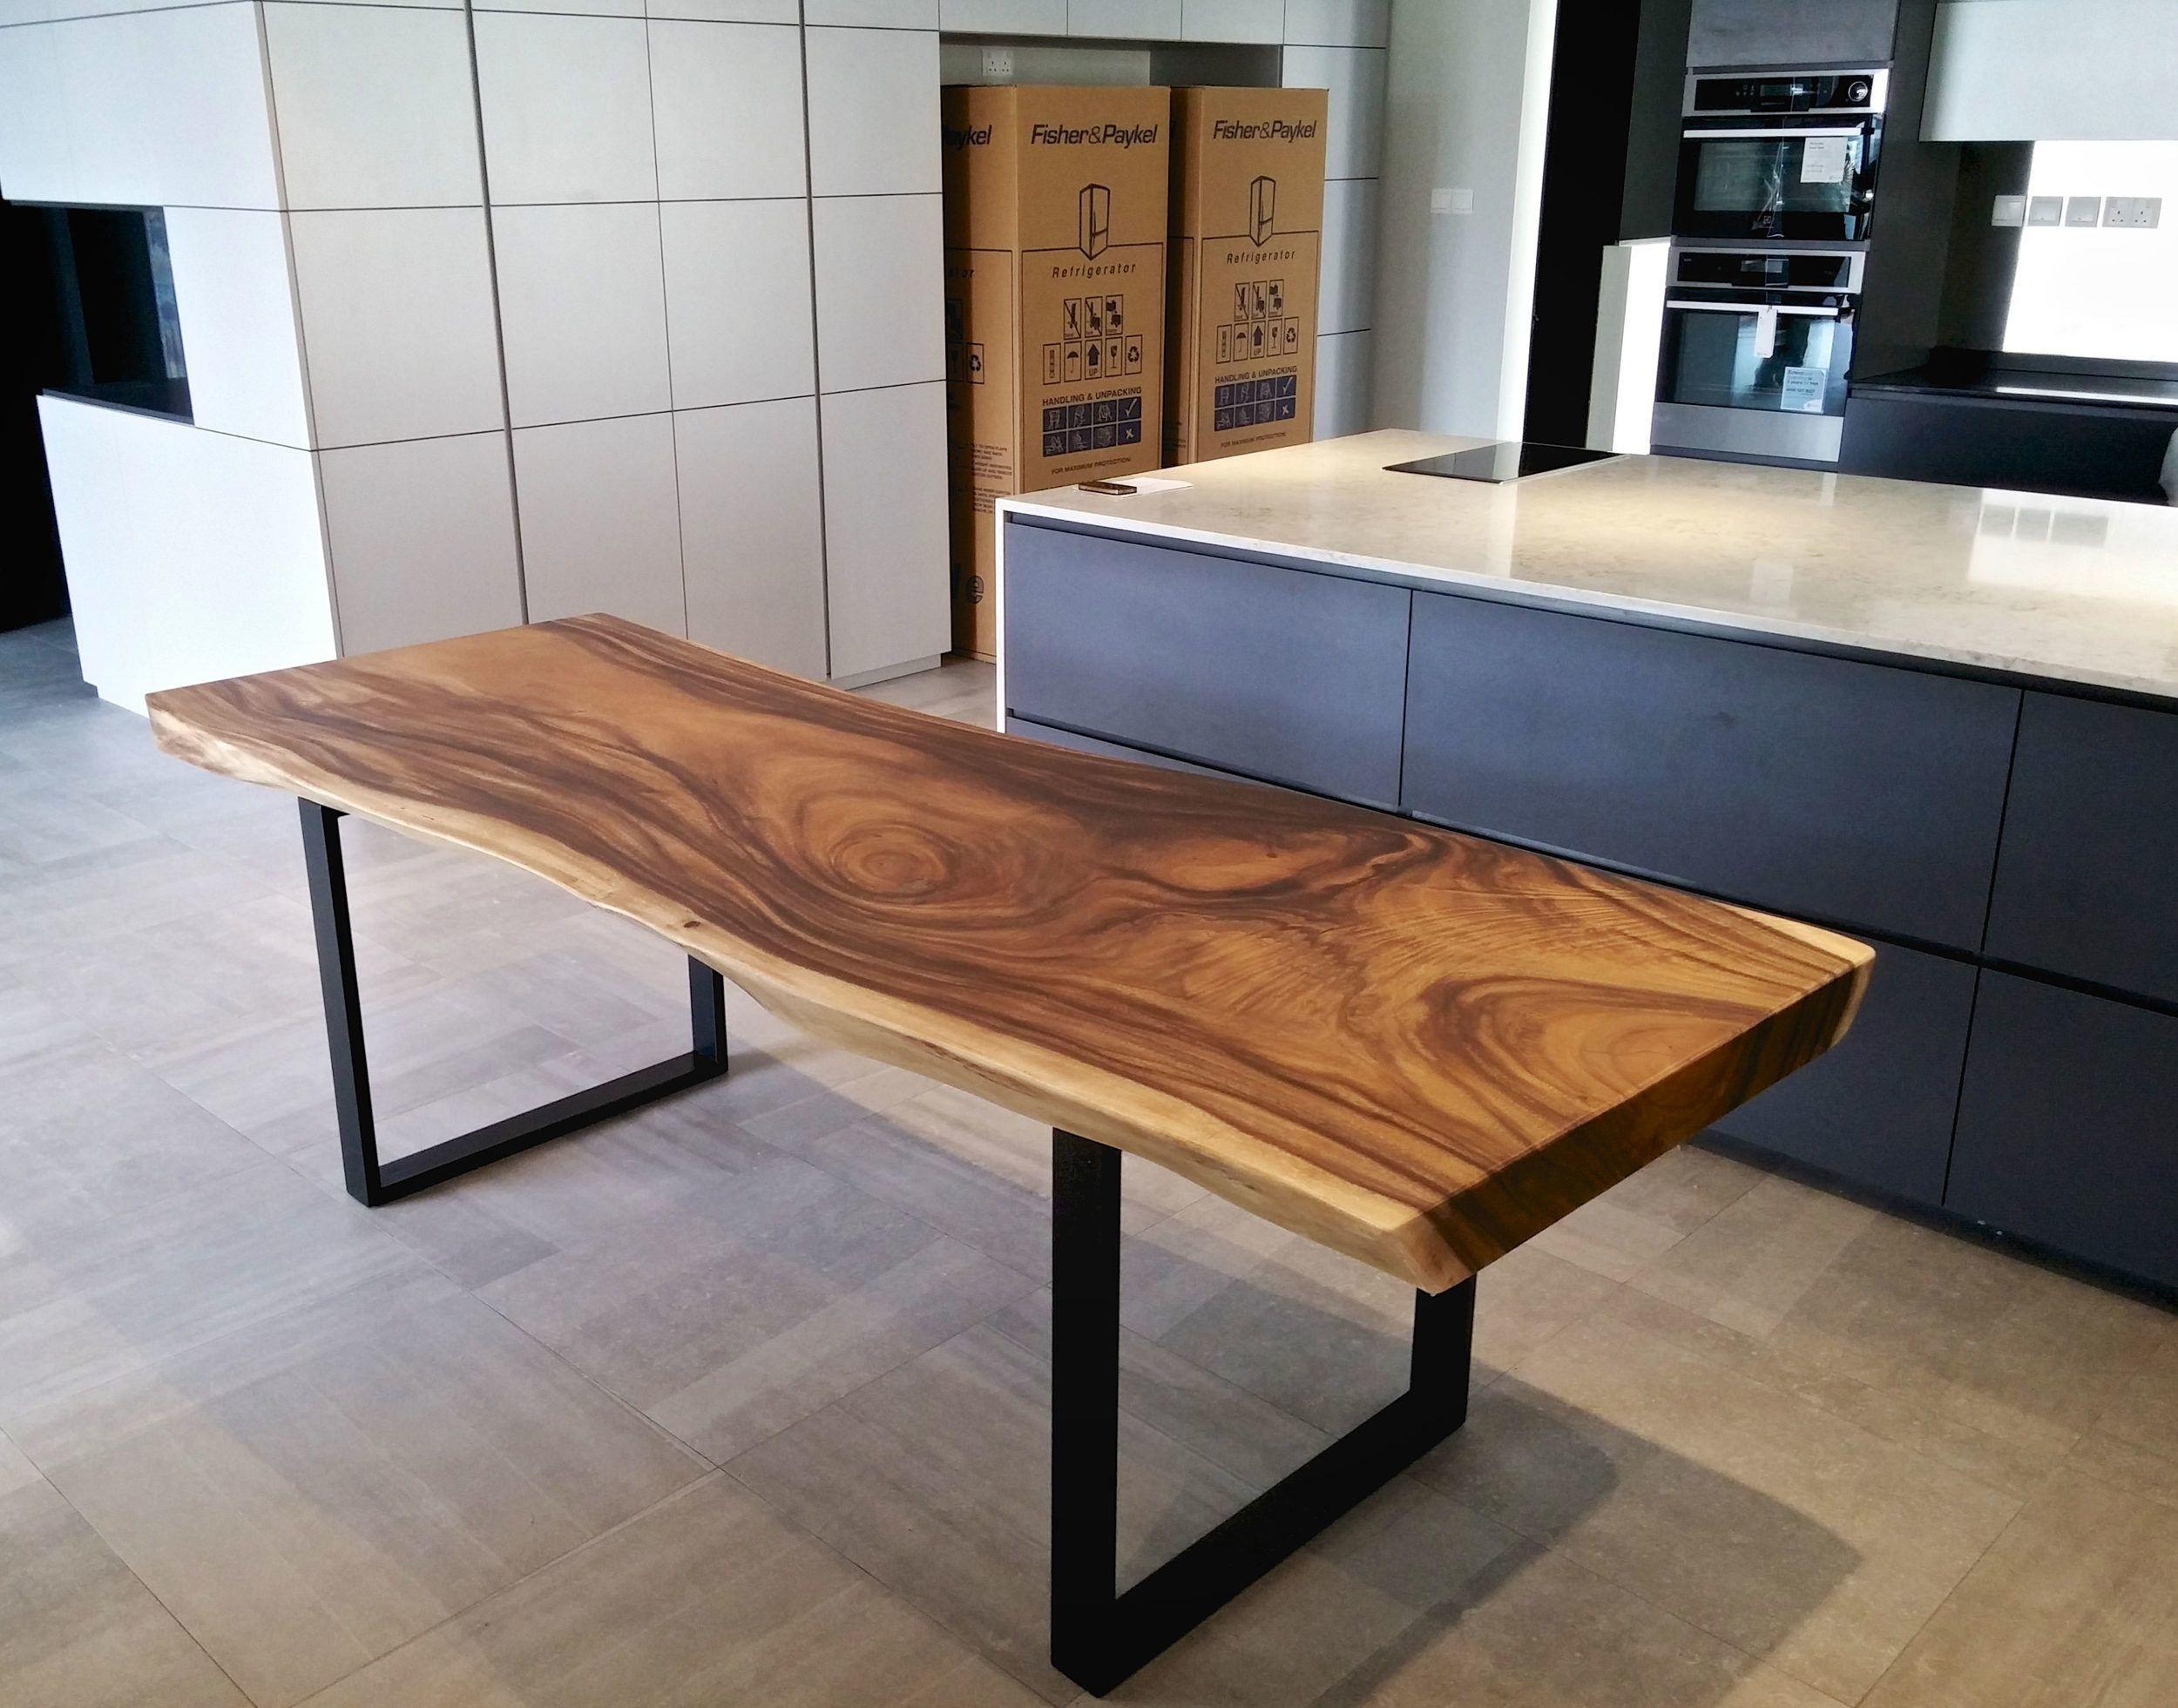 Hot Item Home Furniture Stainless Steel Rectangular Solid Wood Large Dining Table In Foshan V 2021 G Derevyannyj Obedennyj Stol Domashnij Dekor Kuhni Stol Iz Massiva Dereva [ 1961 x 2500 Pixel ]